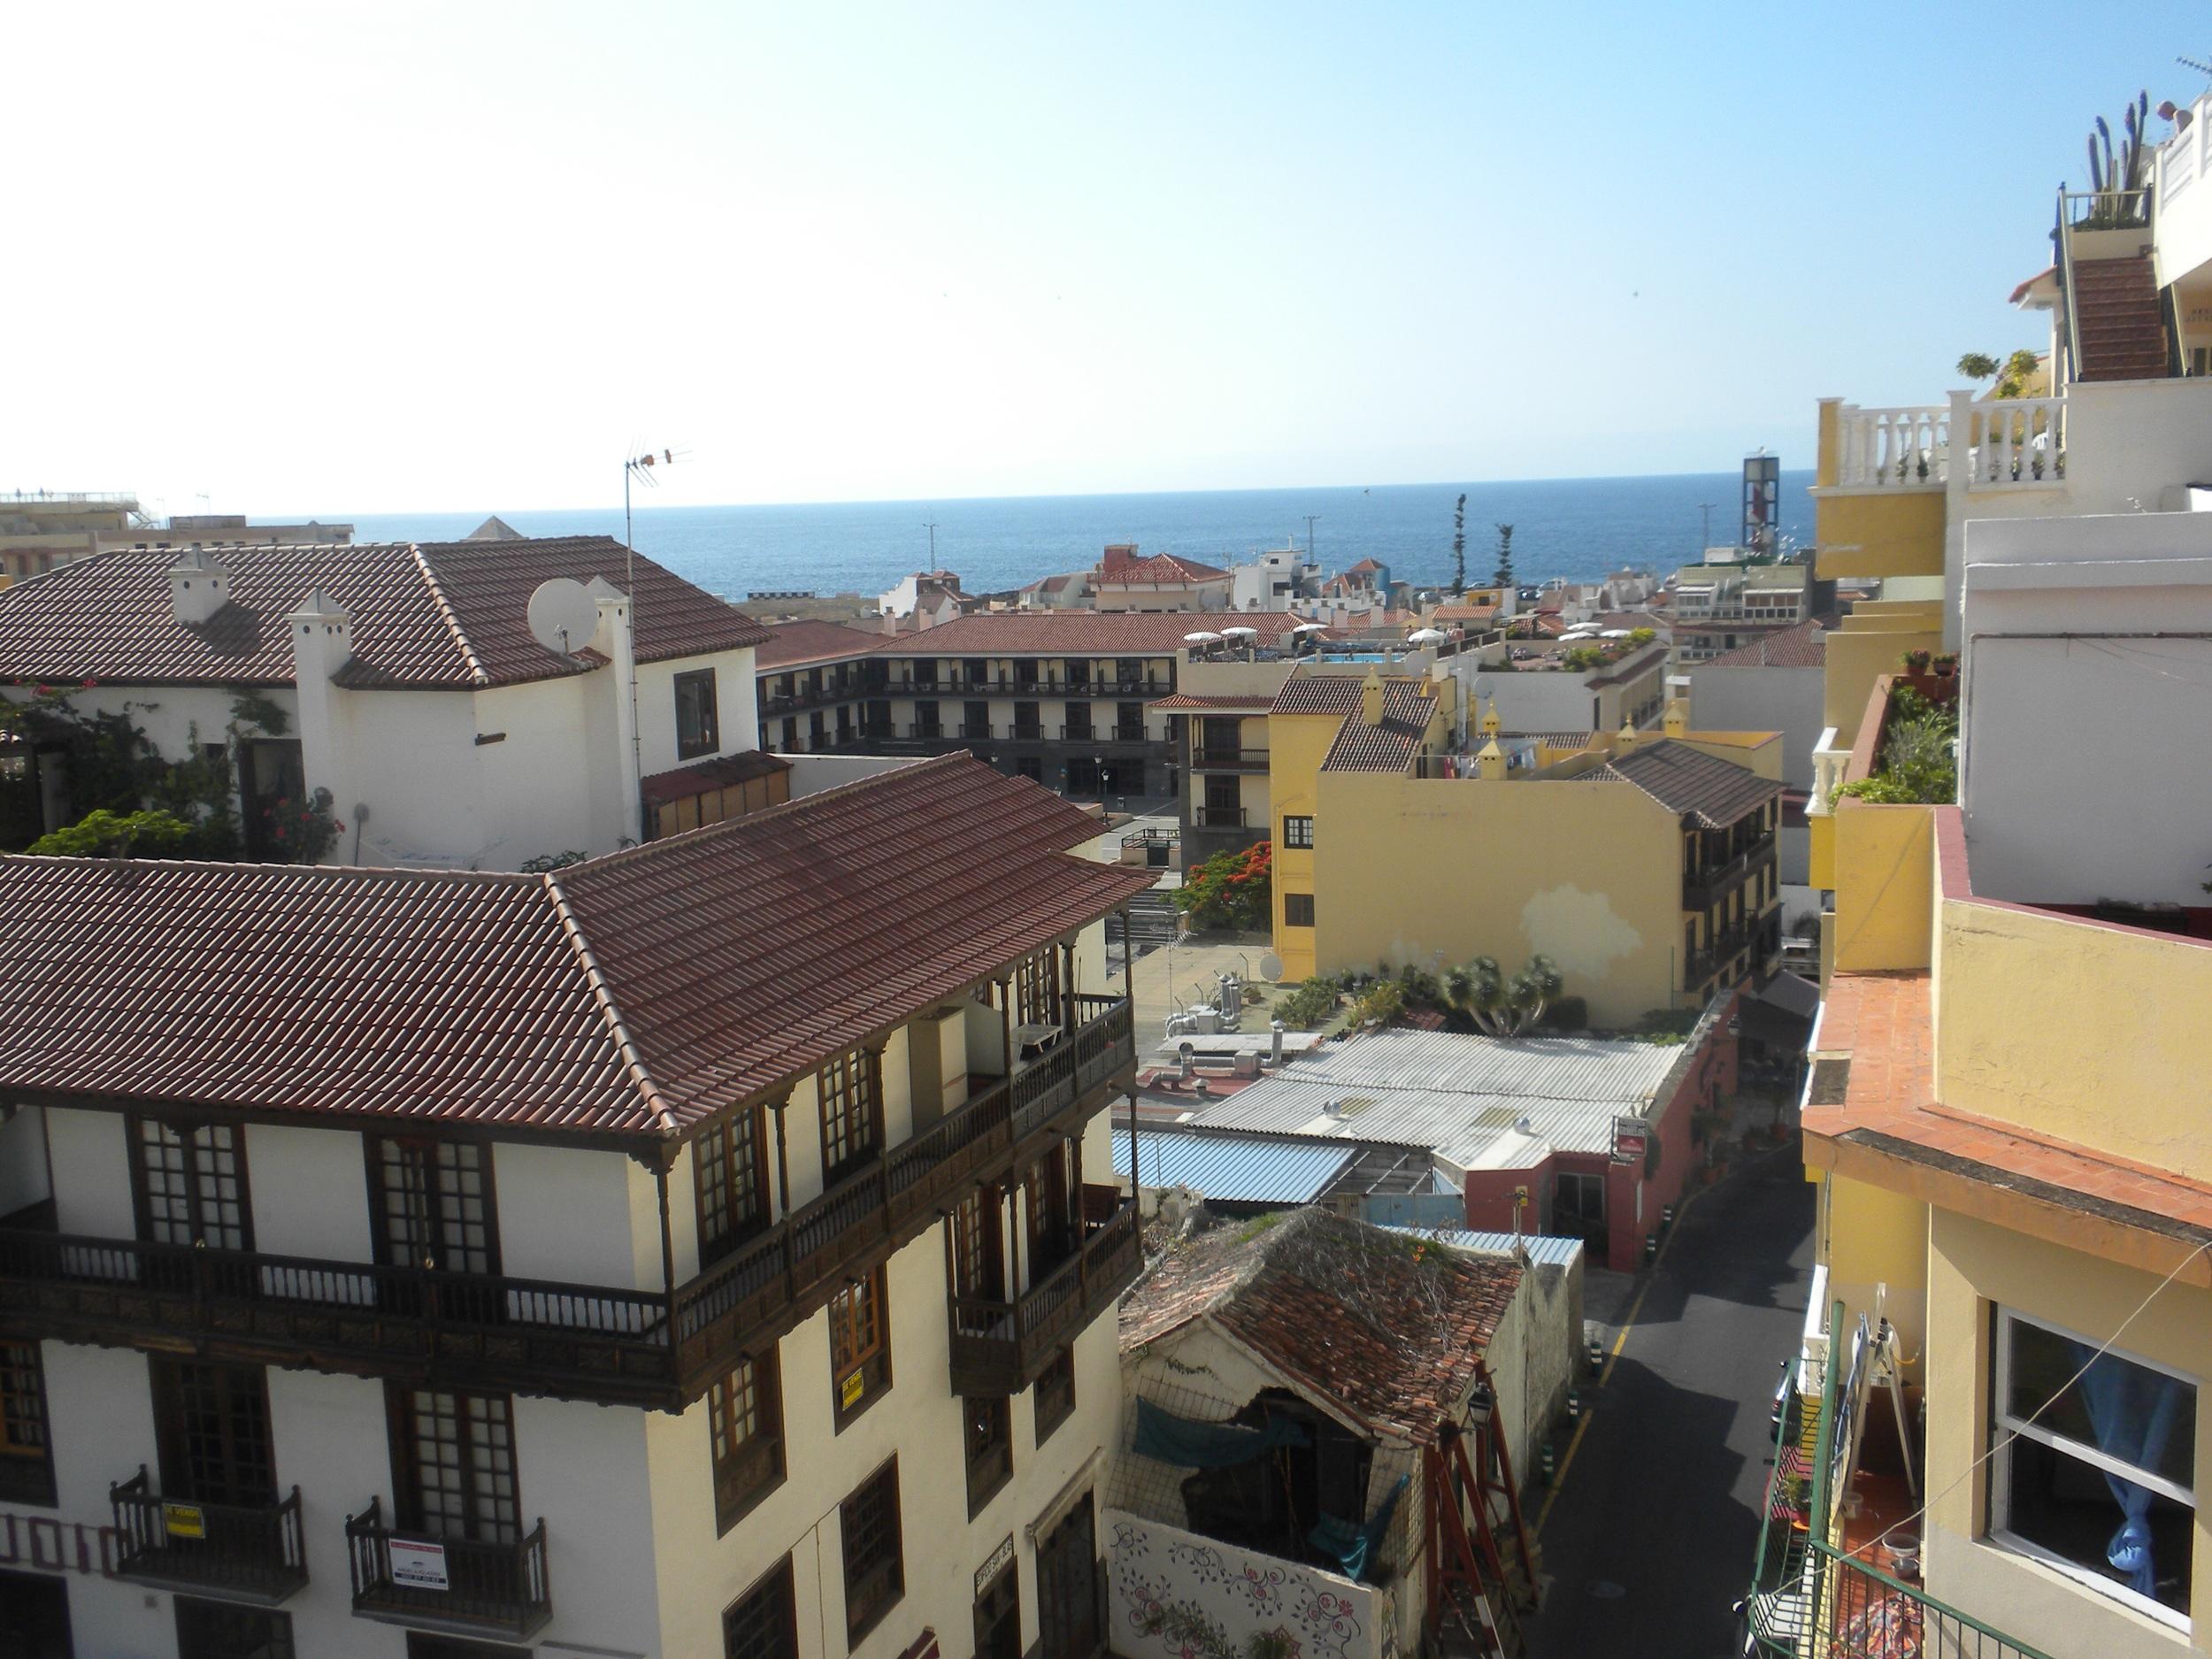 View of Atlantic from our hotel in Puerto de la Cruz, Canary Islands